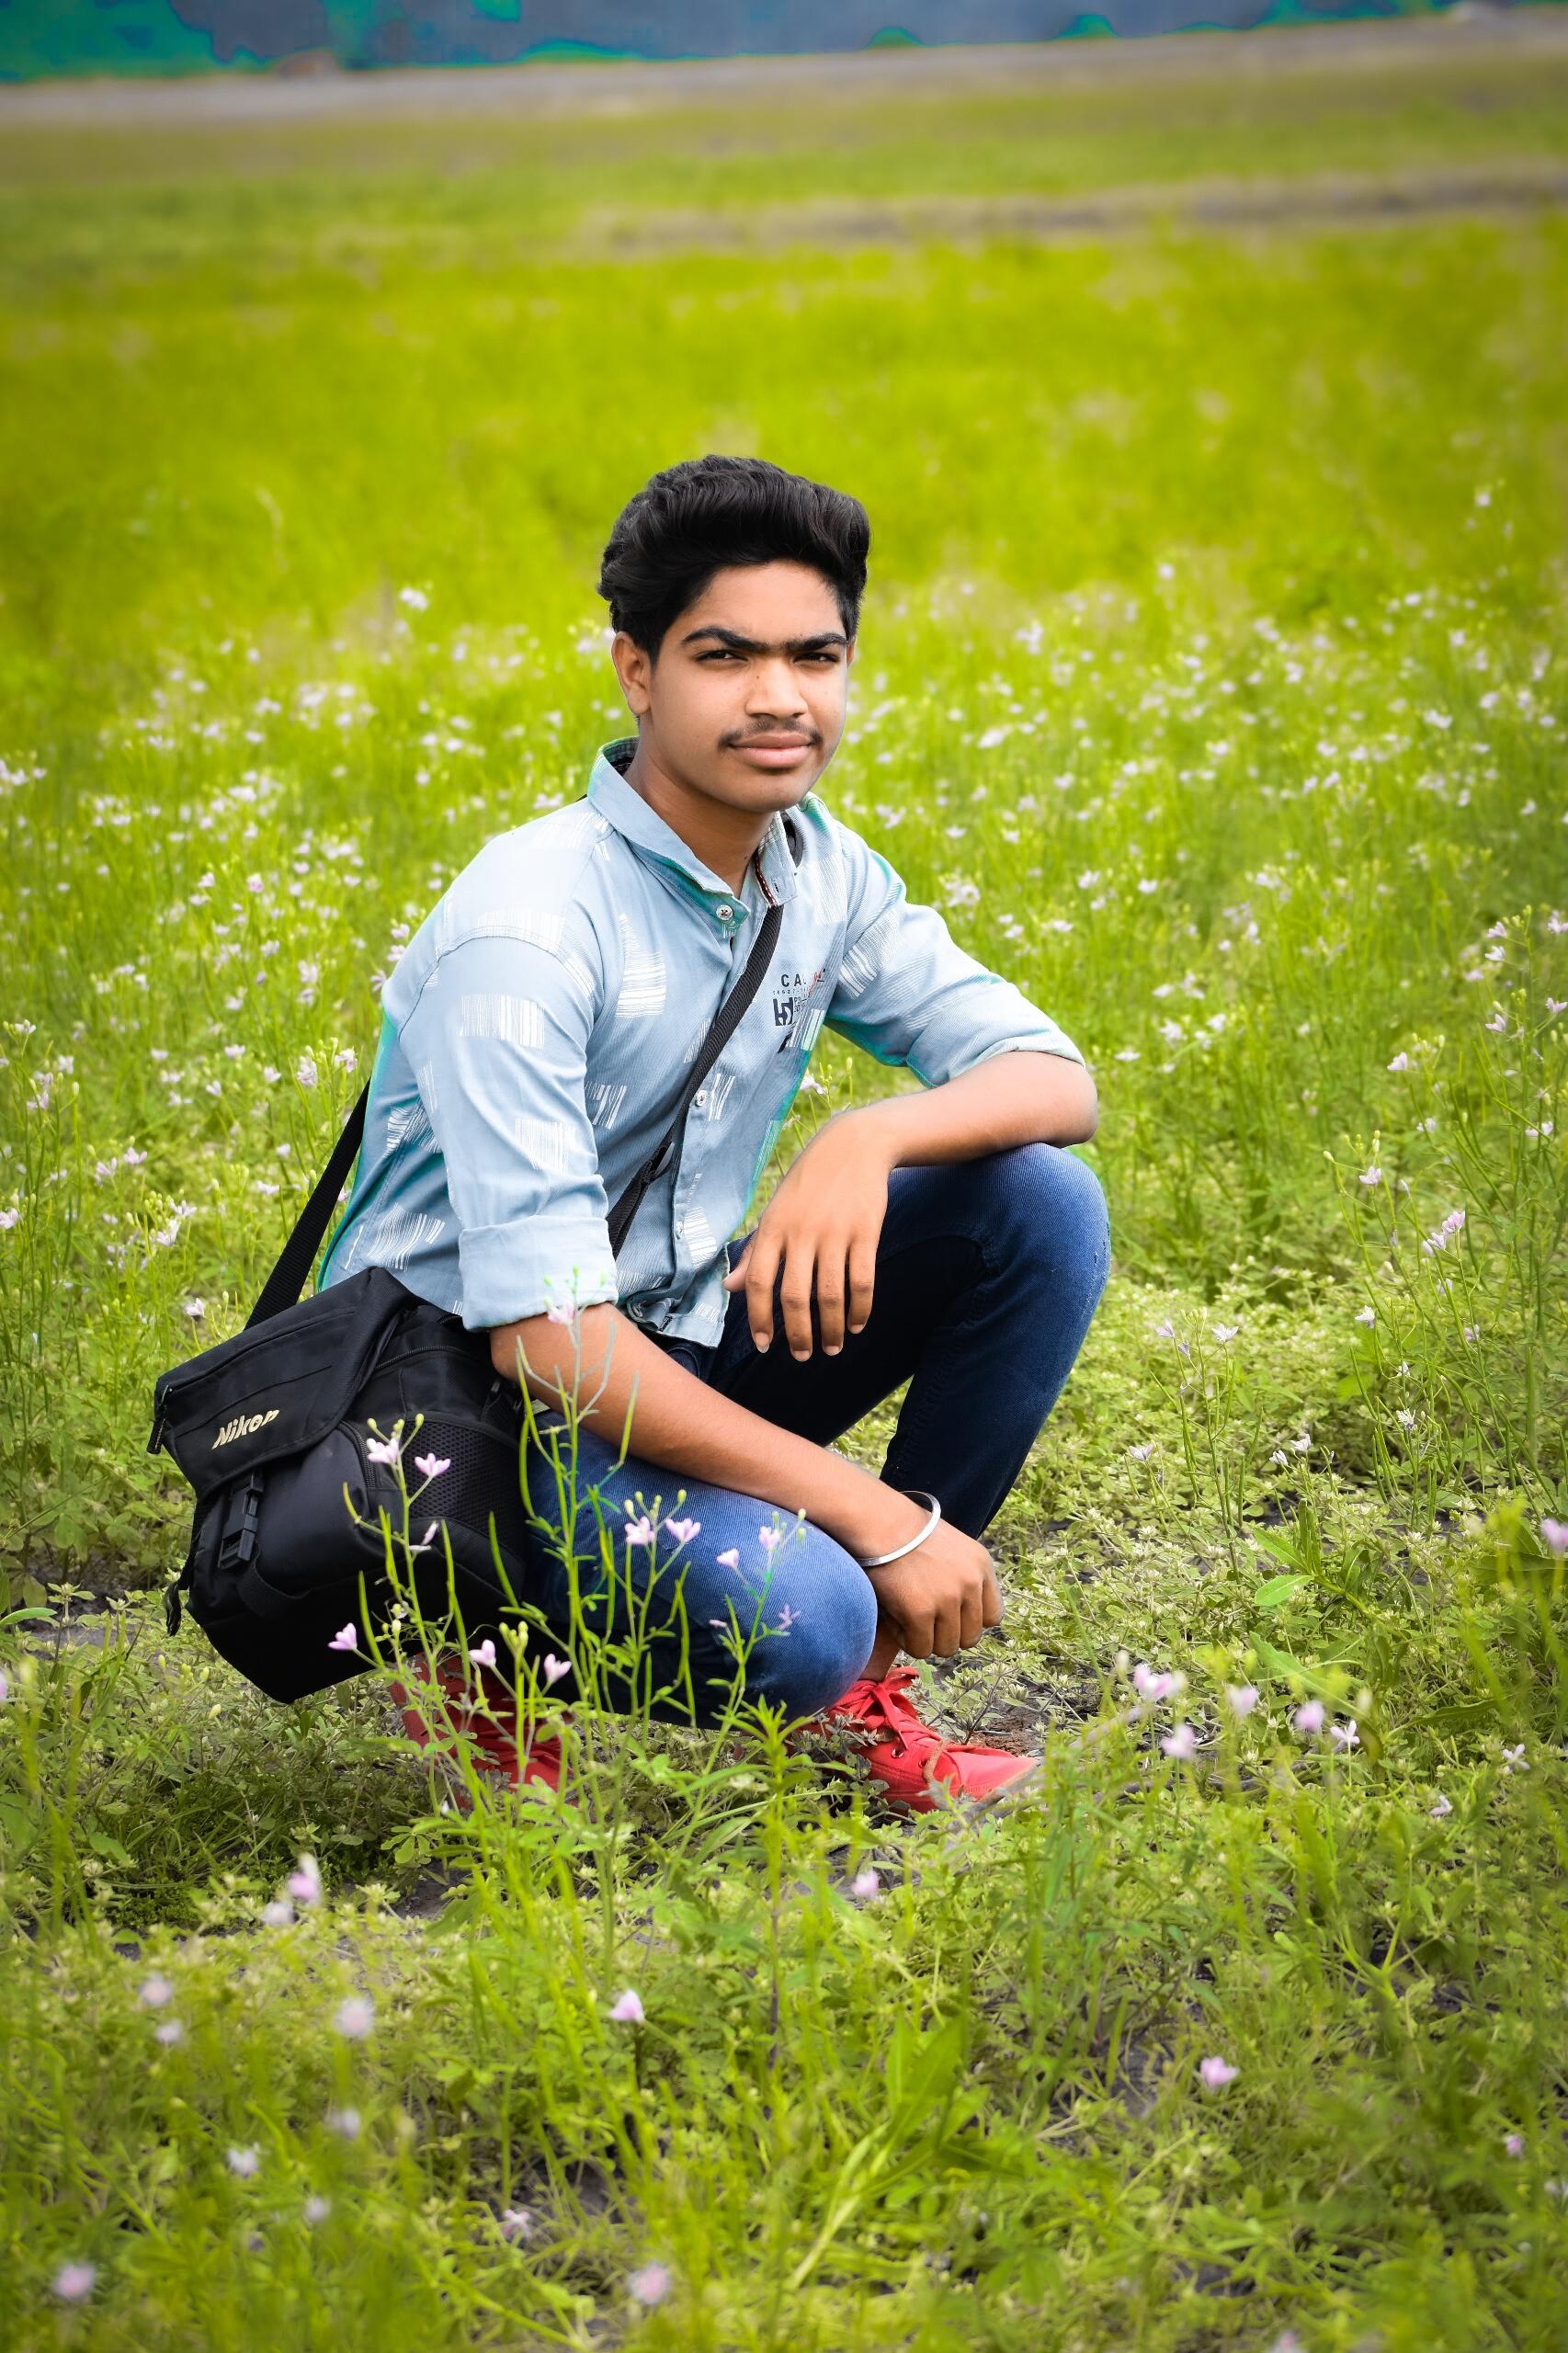 A boy sitting in grass